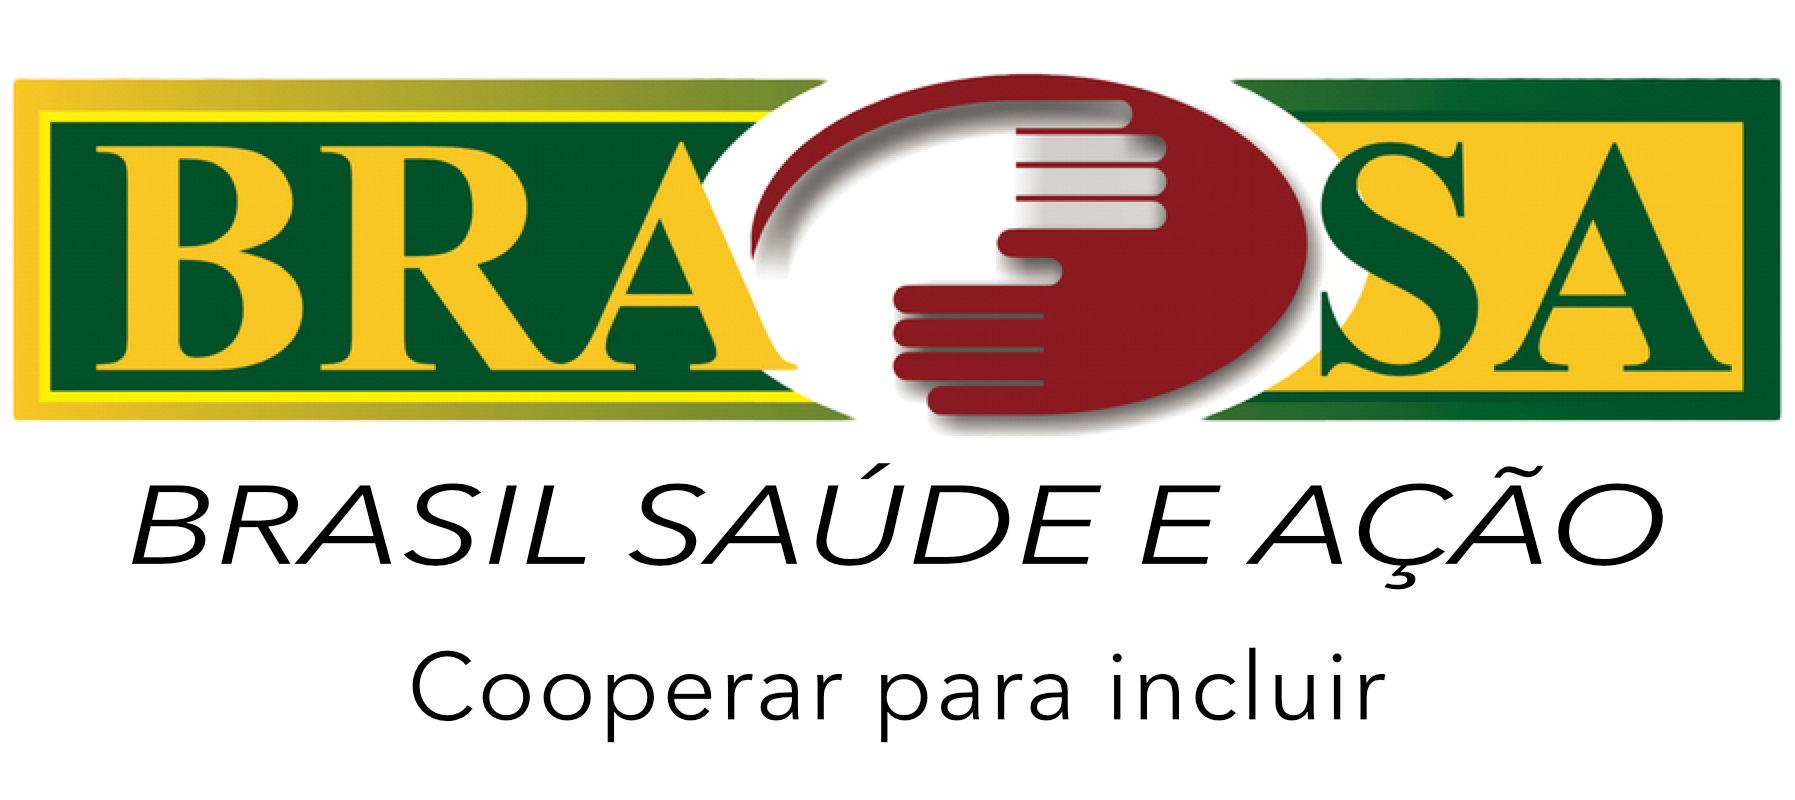 BRASA logo new 2016